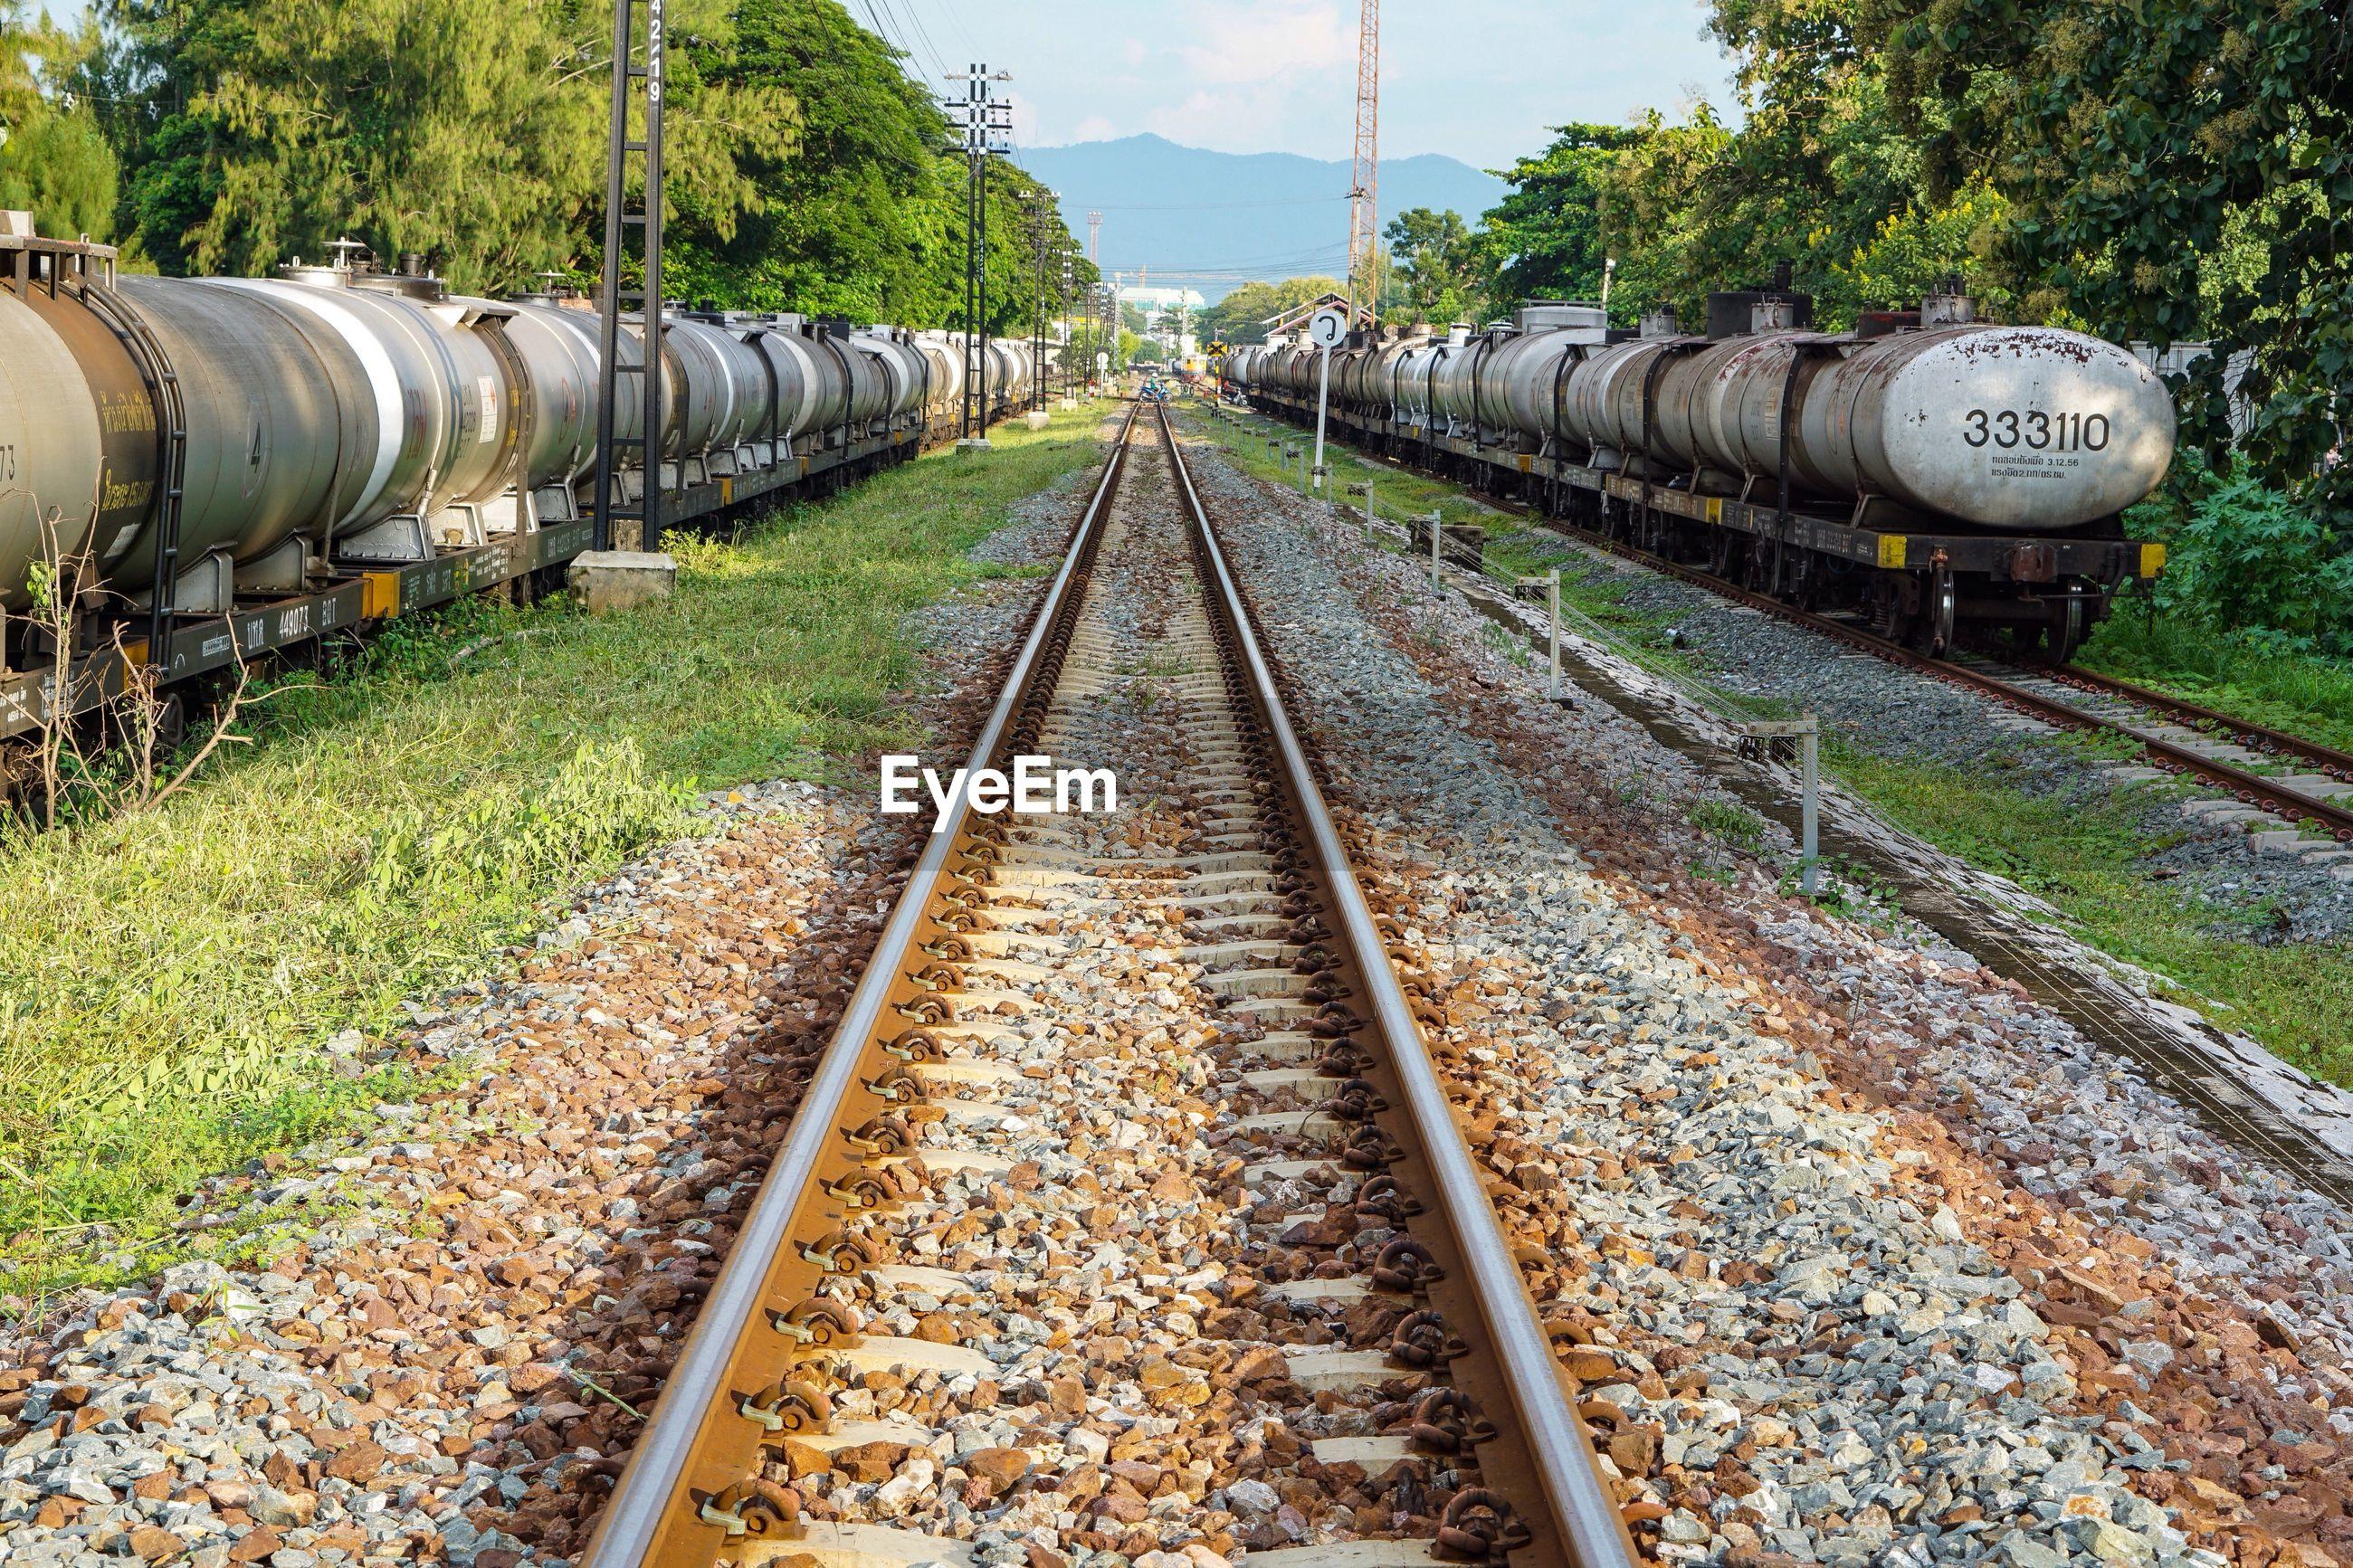 TRAIN AT RAILROAD TRACK